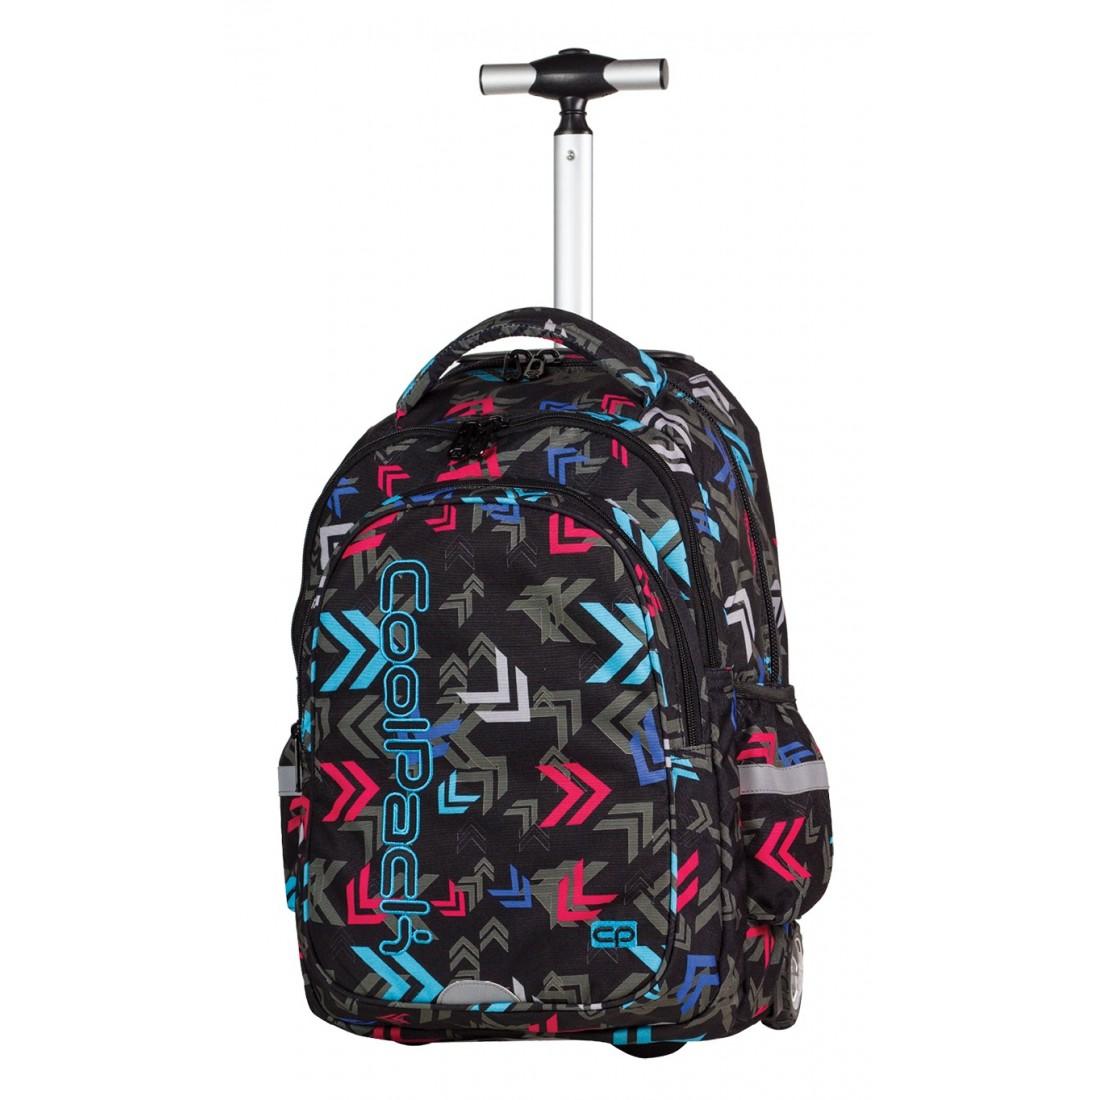 Plecak na kółkach CoolPack Junior ARROWS CP 552 - plecak-tornister.pl